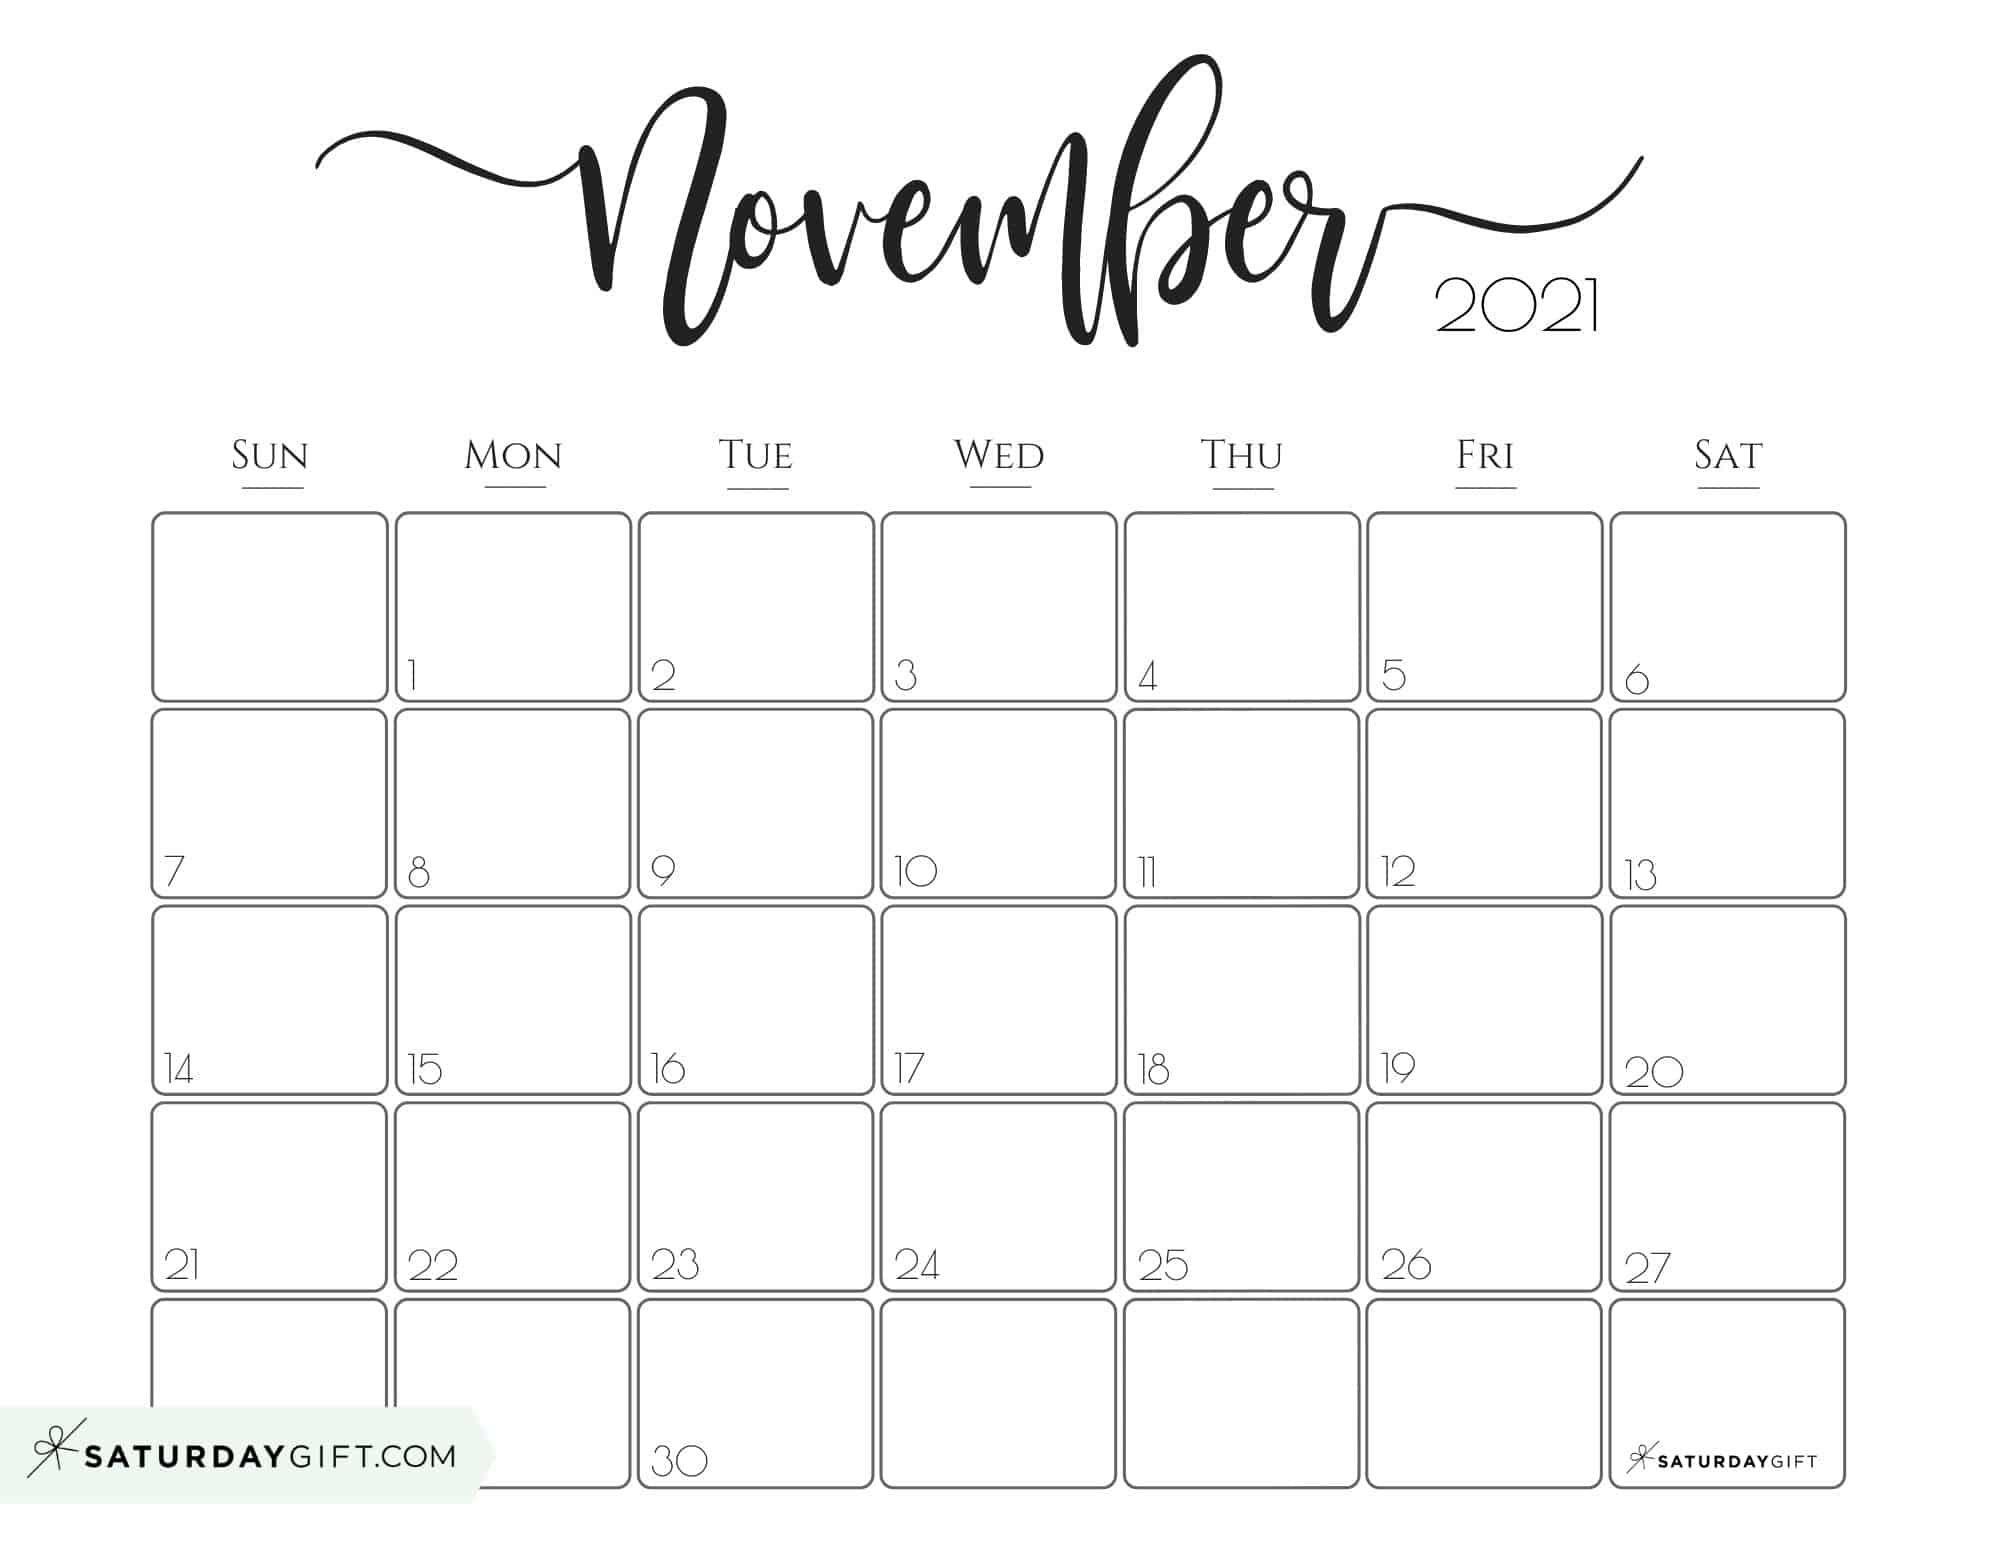 November 2021 Calendar To Print | Calendar 2021